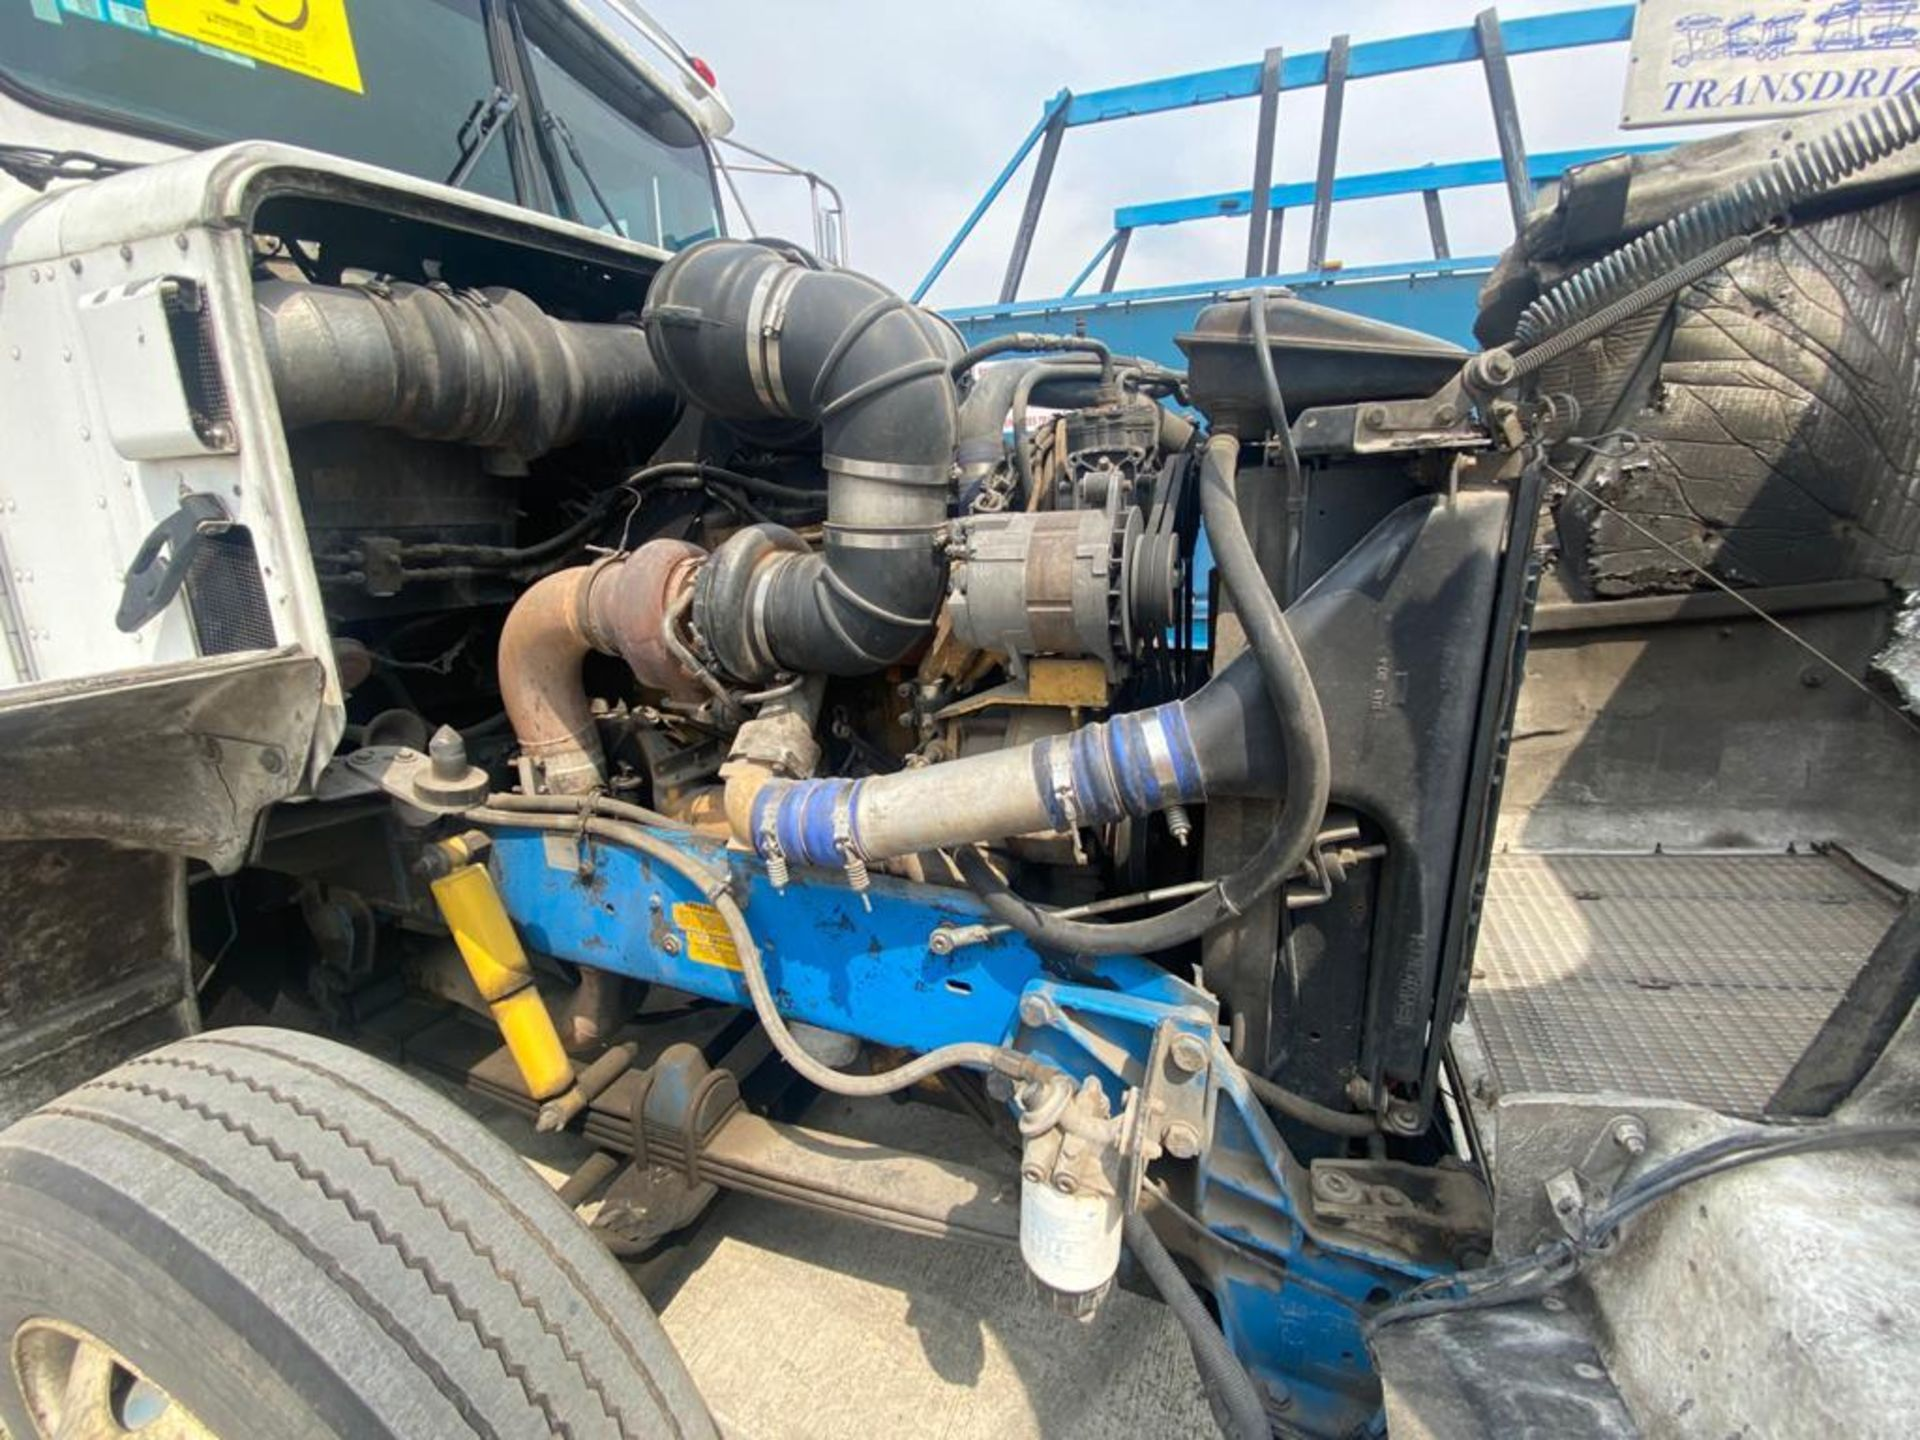 1999 Kenworth Sleeper truck tractor, standard transmission of 18 speeds - Image 49 of 62